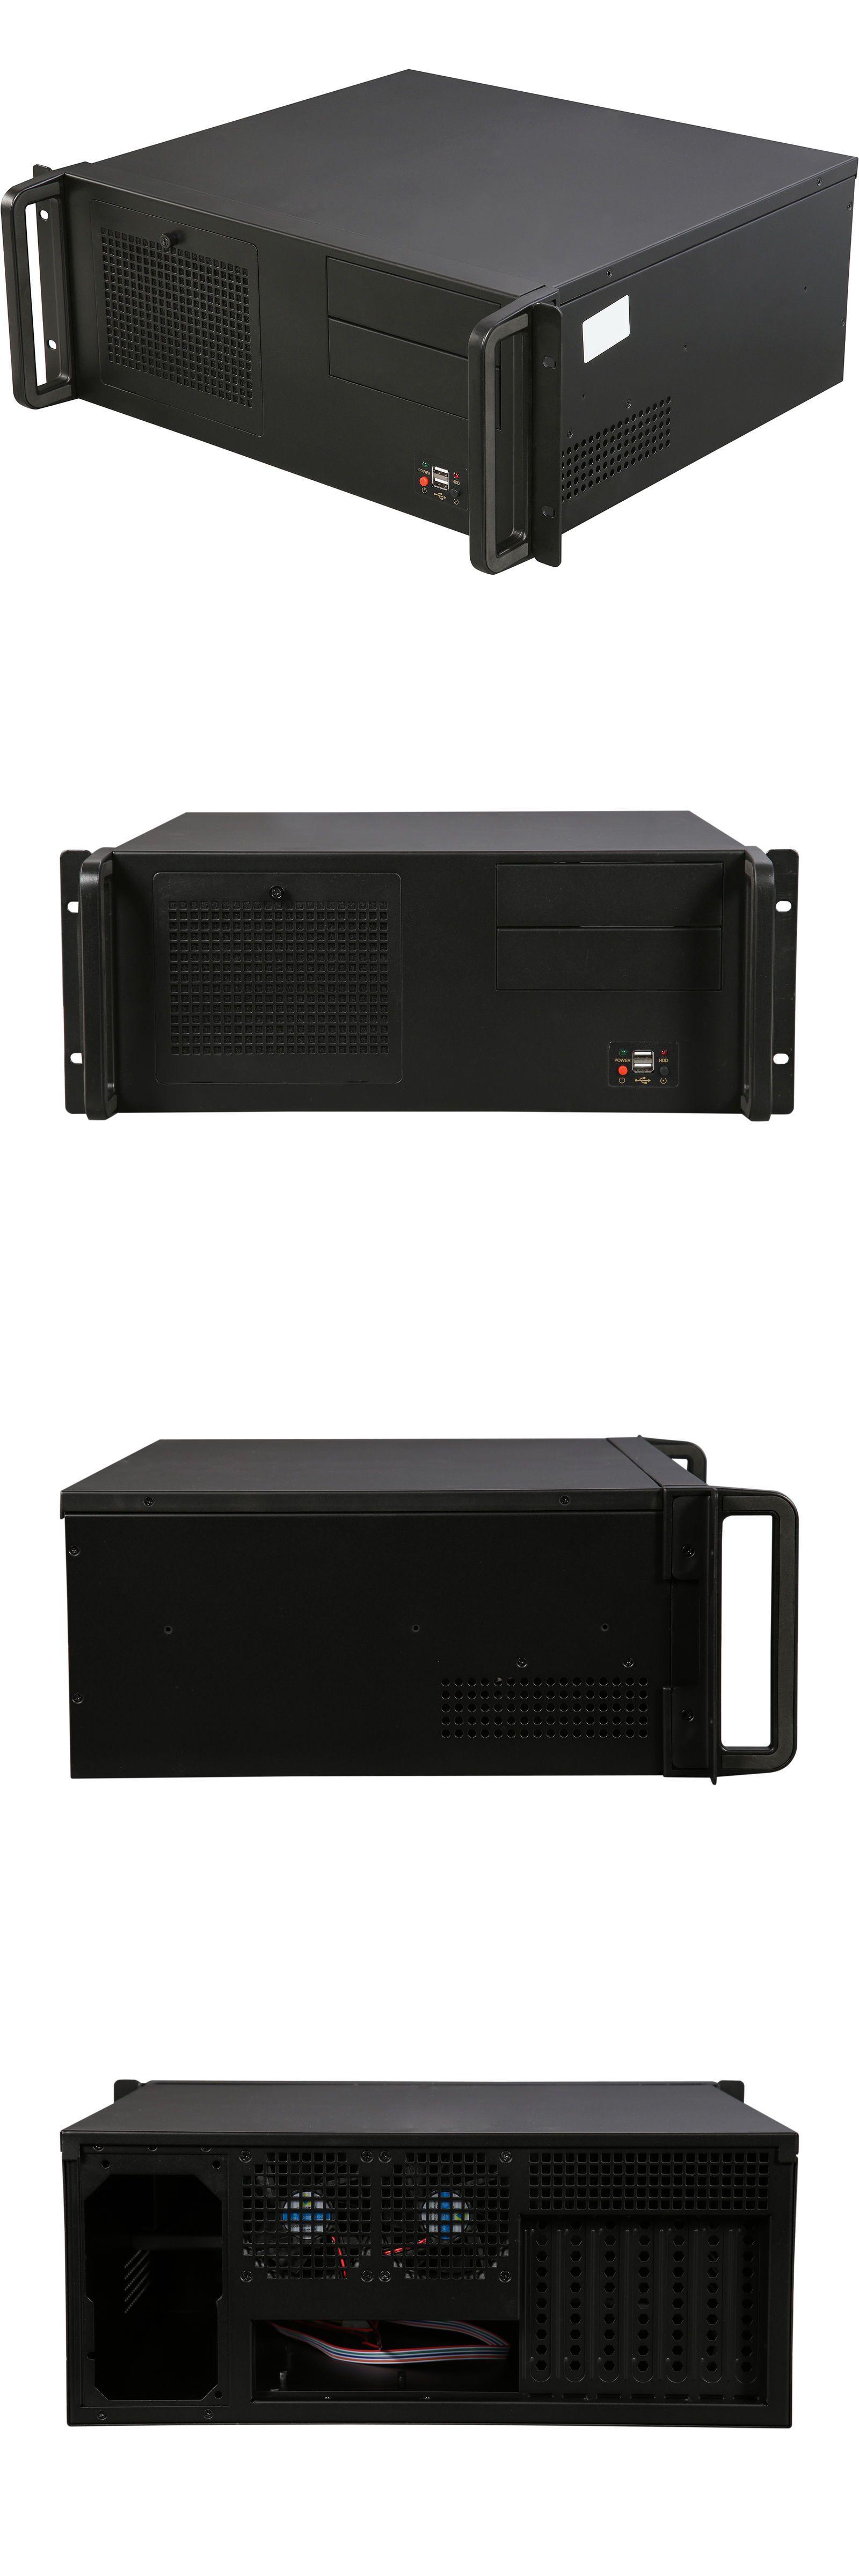 Rosewill Rsv R4100 4u Rackmount Server Case 8 Internal Bays Includes 2 Fans Computer Case Best Computer Case